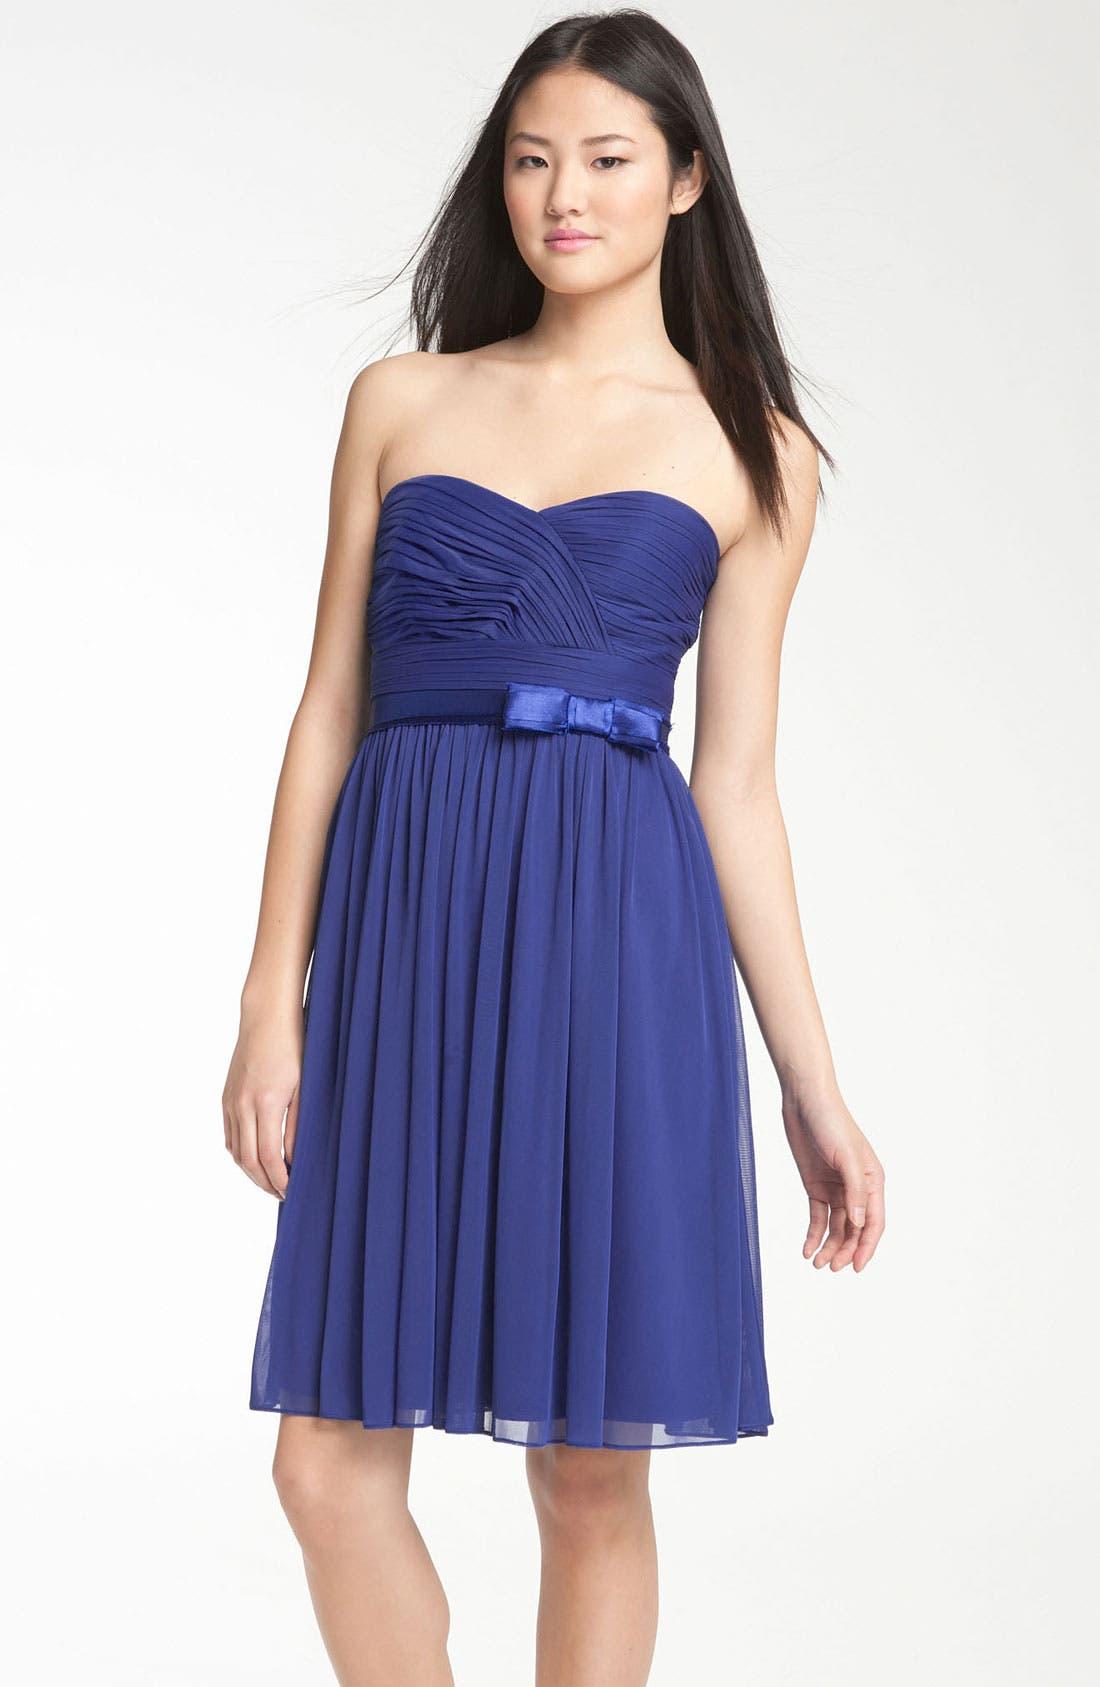 Main Image - ML Monique Lhuillier Bridesmaids Sweetheart Chiffon Dress (Nordstrom Exclusive)